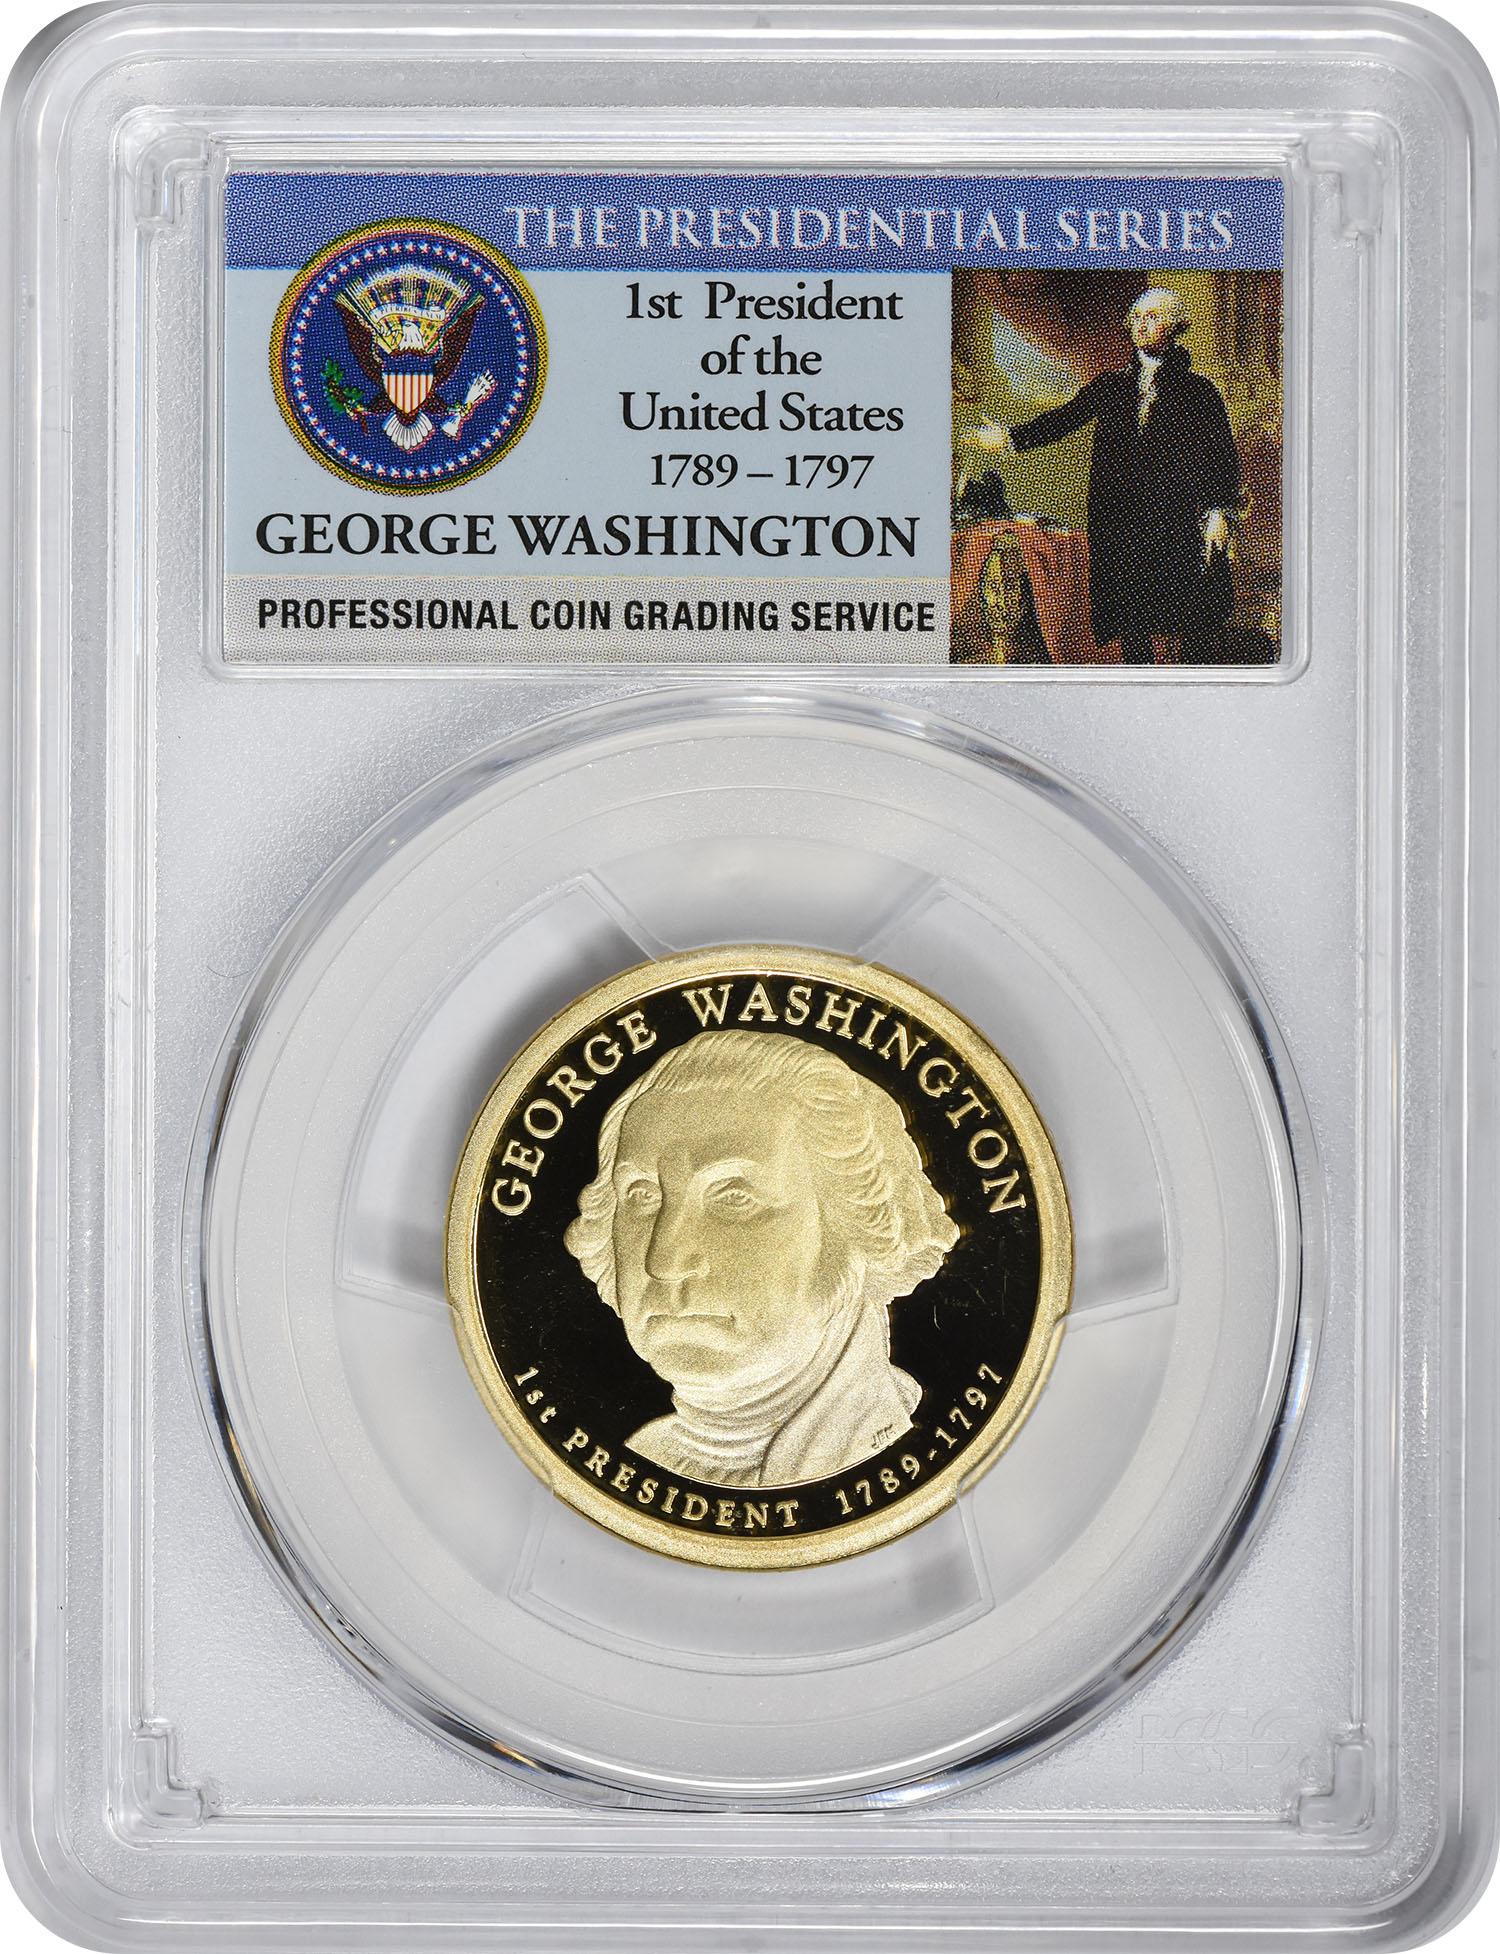 2007-S George Washington Presidential Dollar, PR69DCAM, PCGS